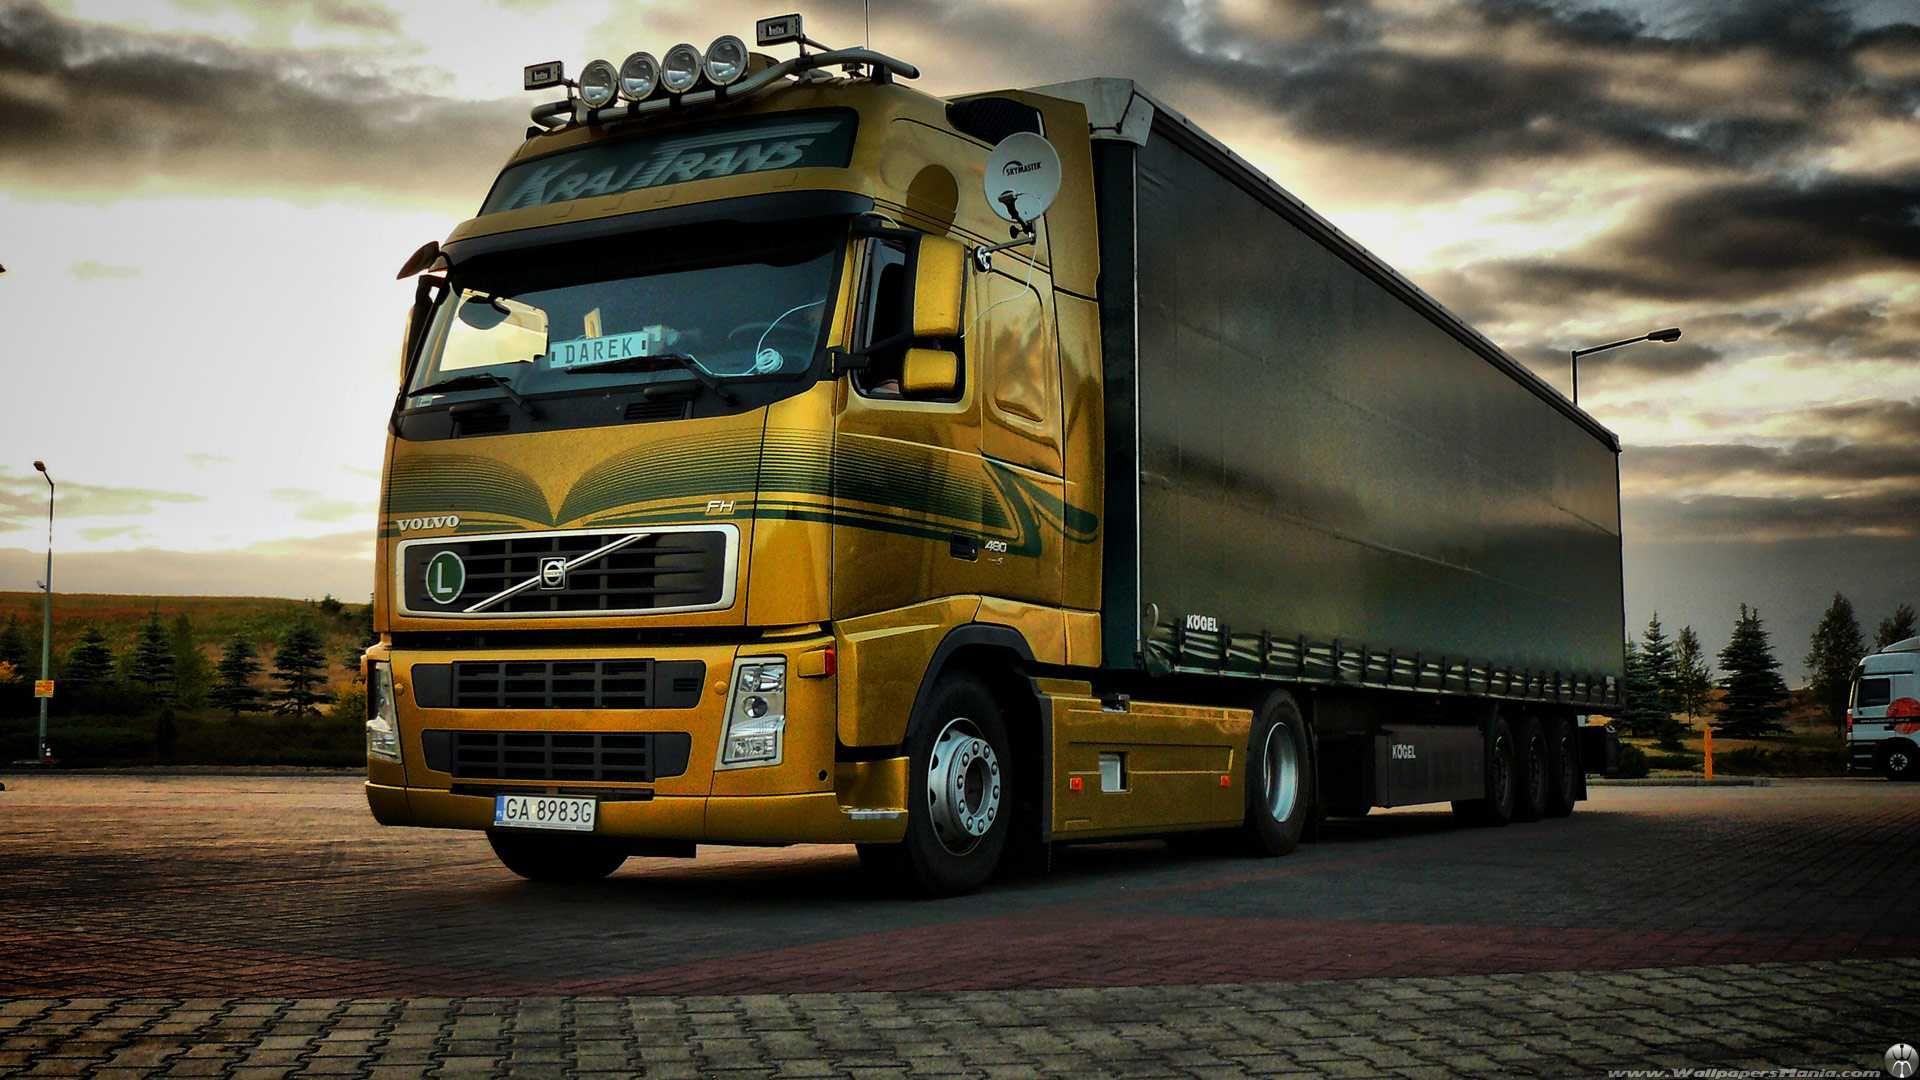 Volvo Truck Wallpaper High Definition nh6 Cars